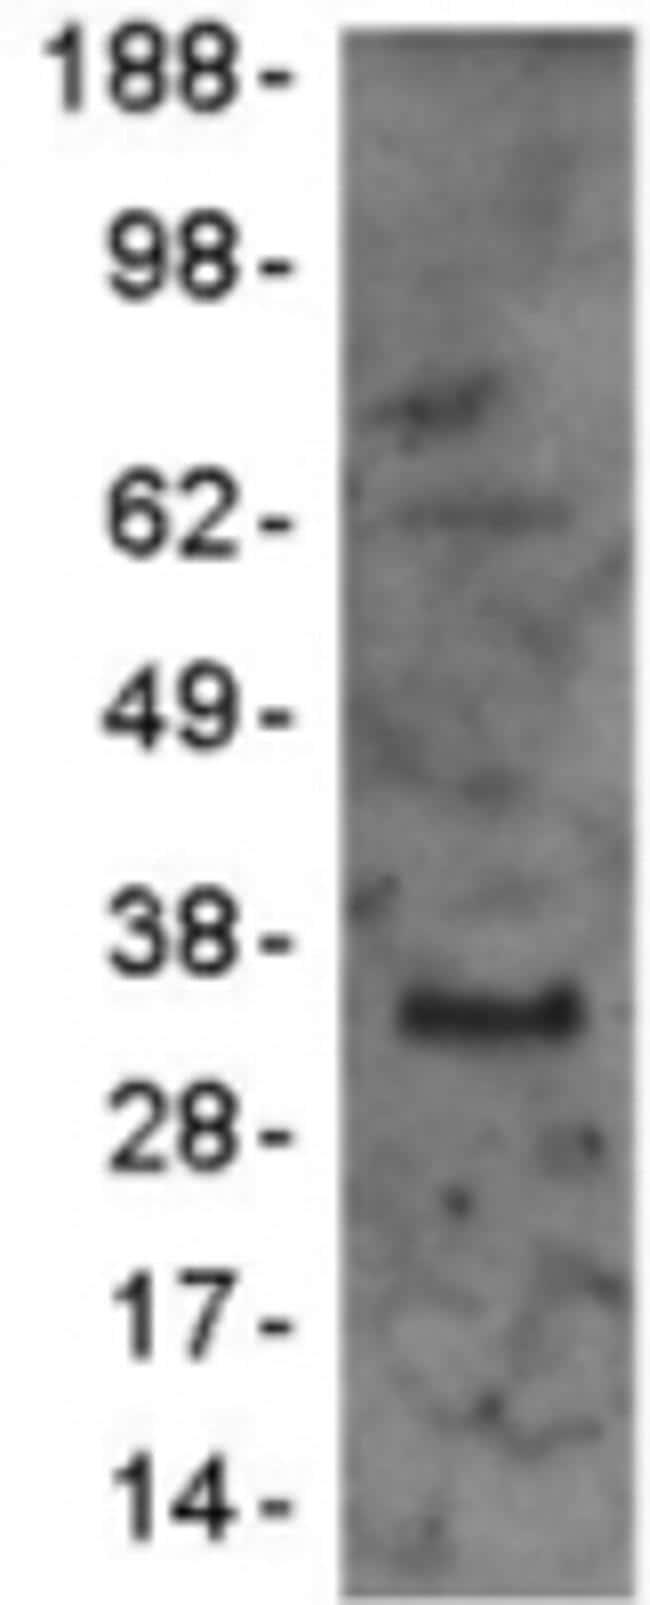 CD79a Antibody in Immunoblot (IB)